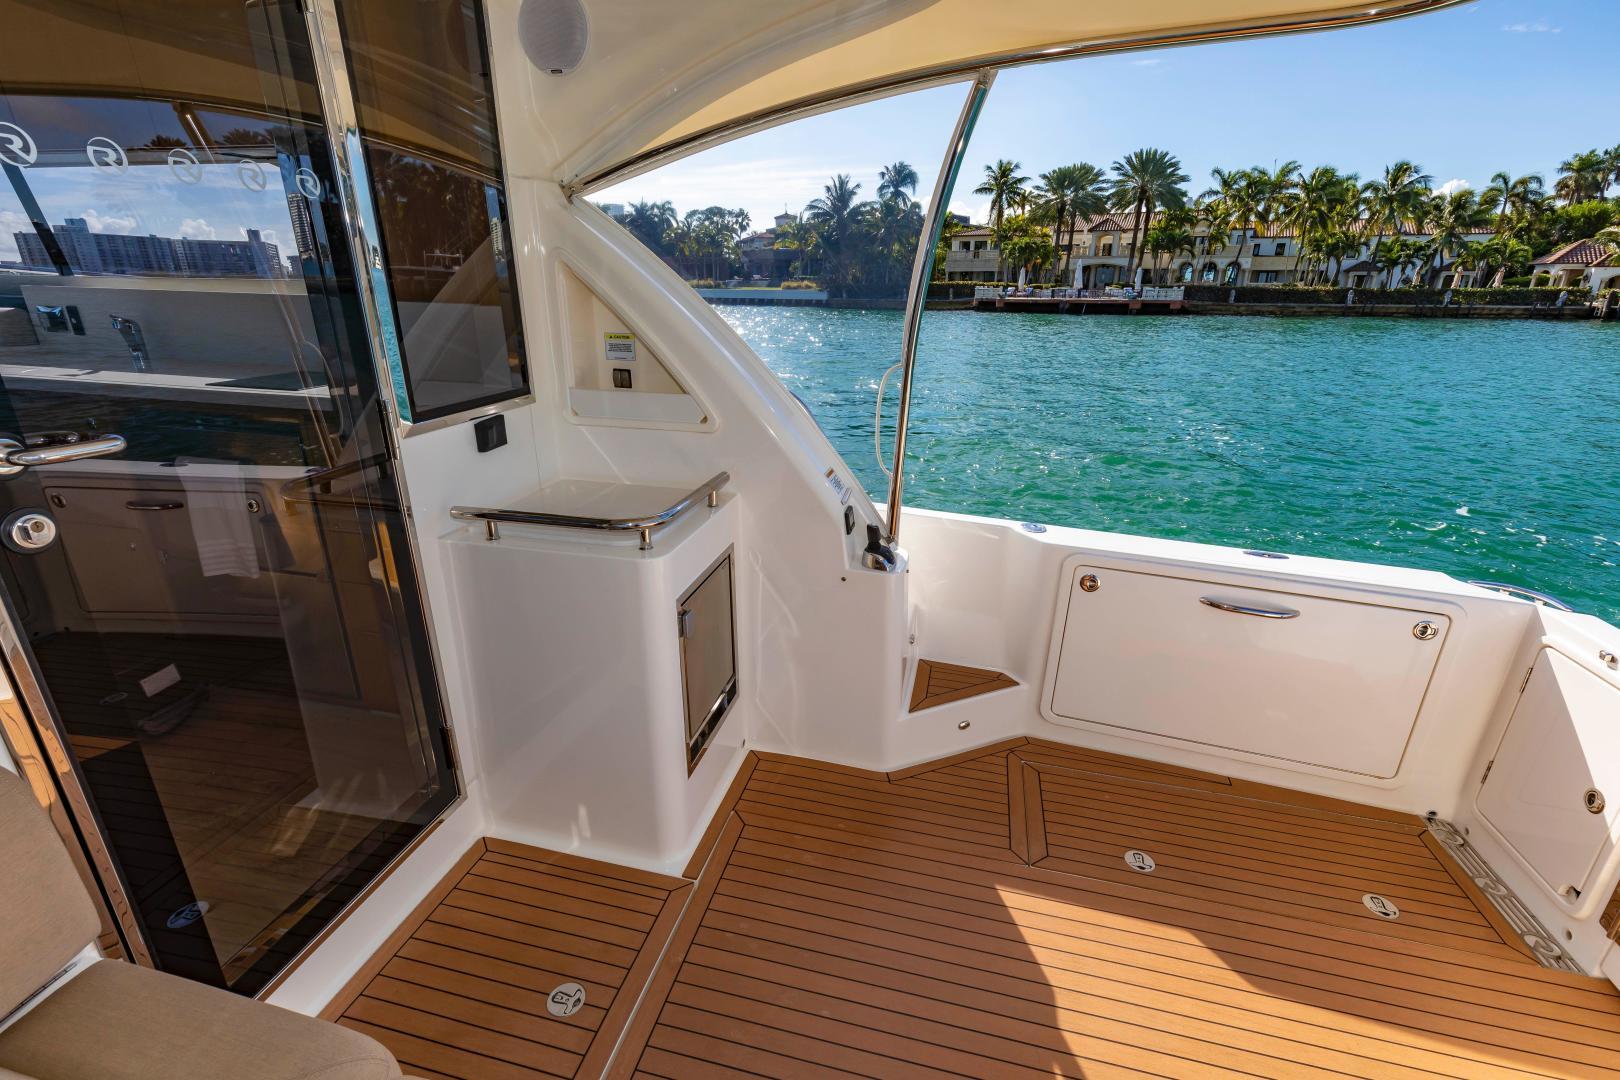 Riviera-395 SUV 2019-Ipanema Miami Beach-Florida-United States-1614890   Thumbnail